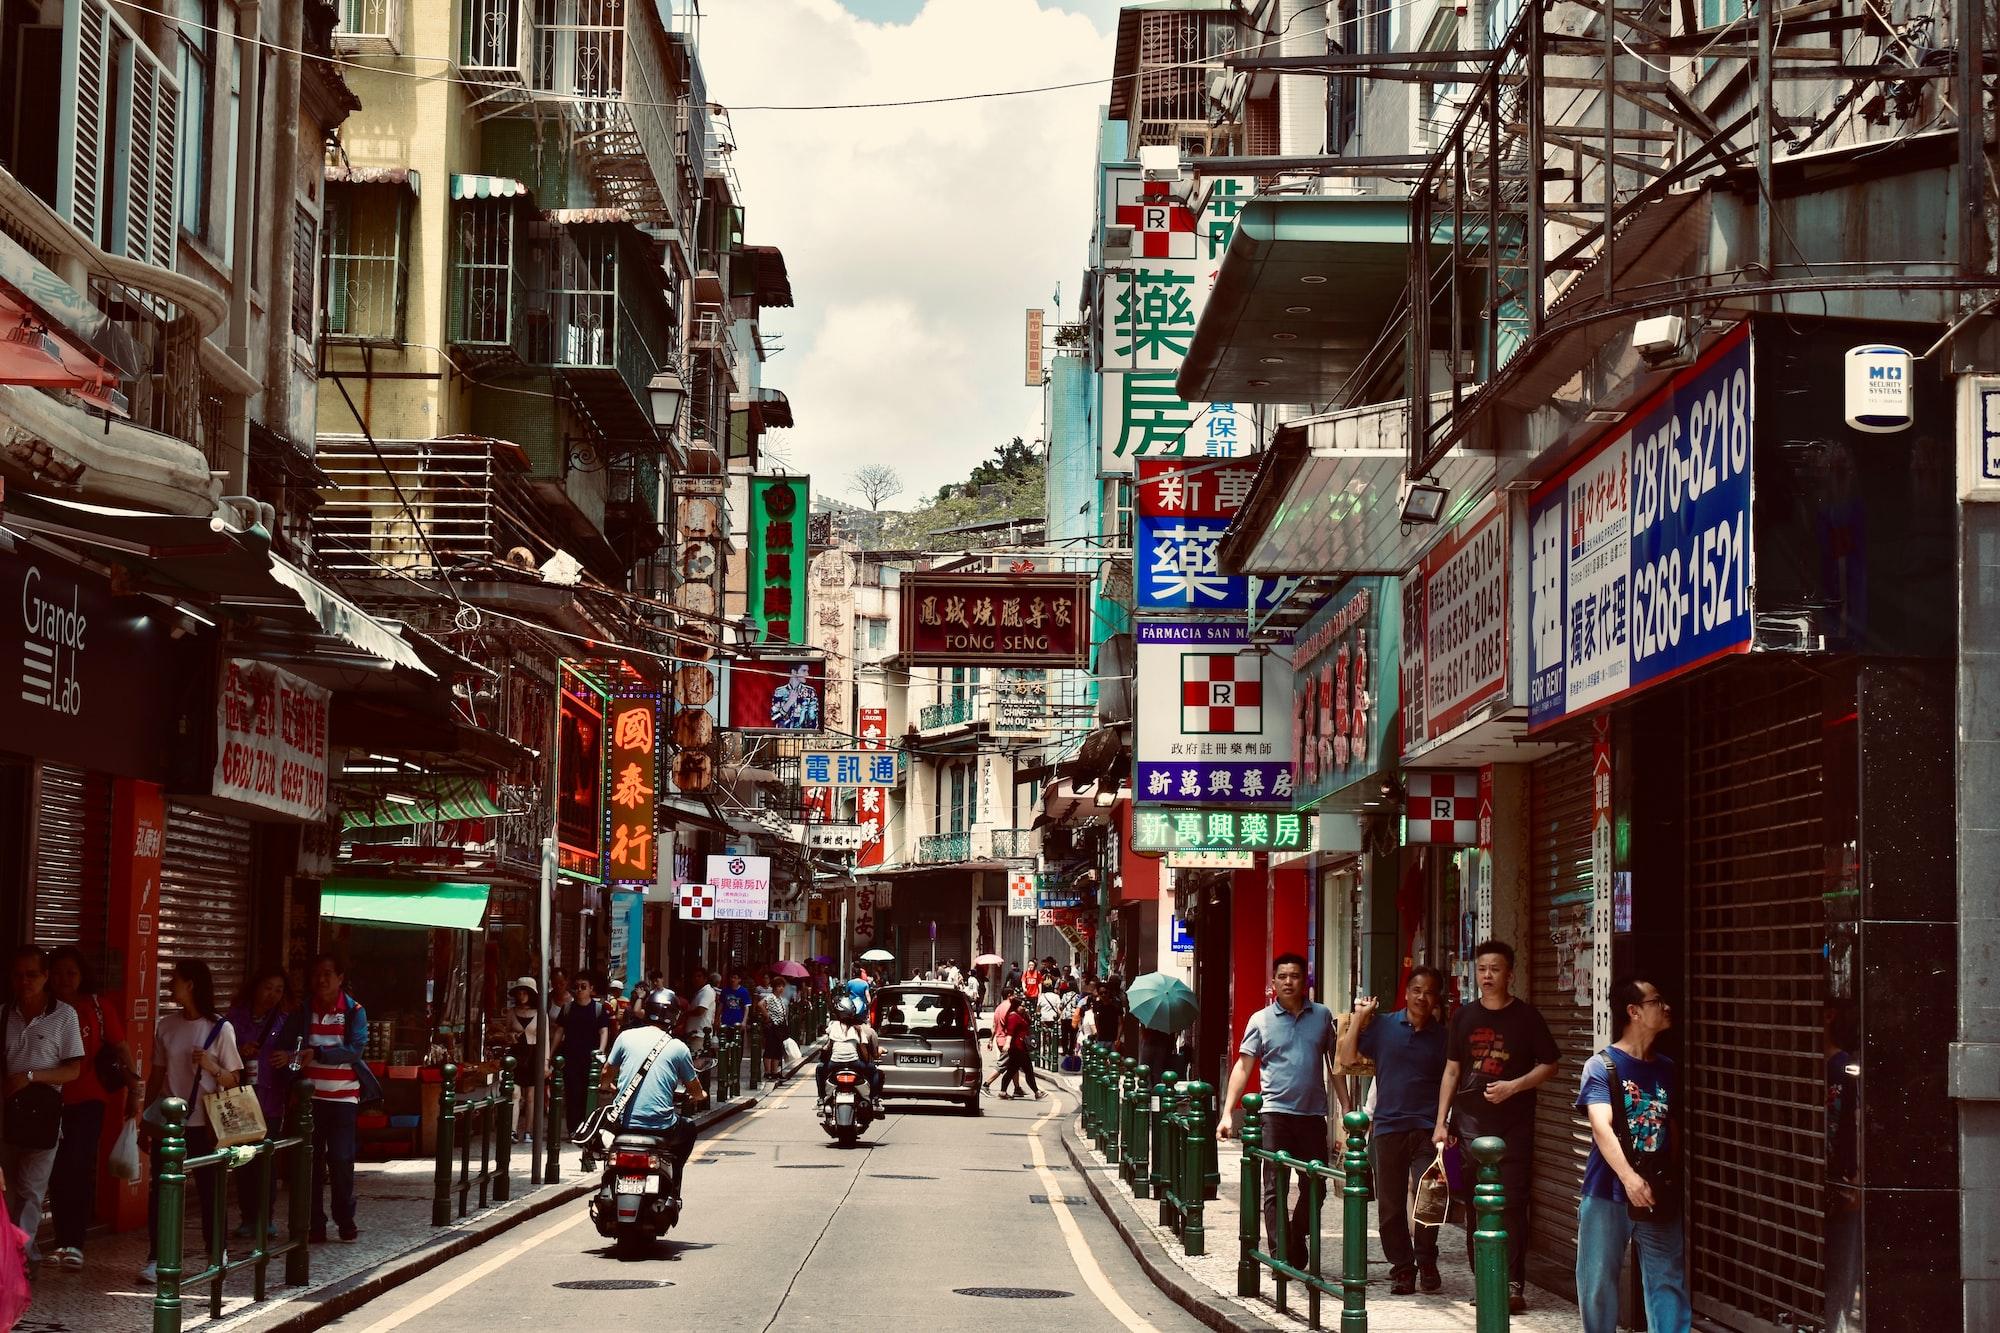 BEYOND Expo Macao 2021